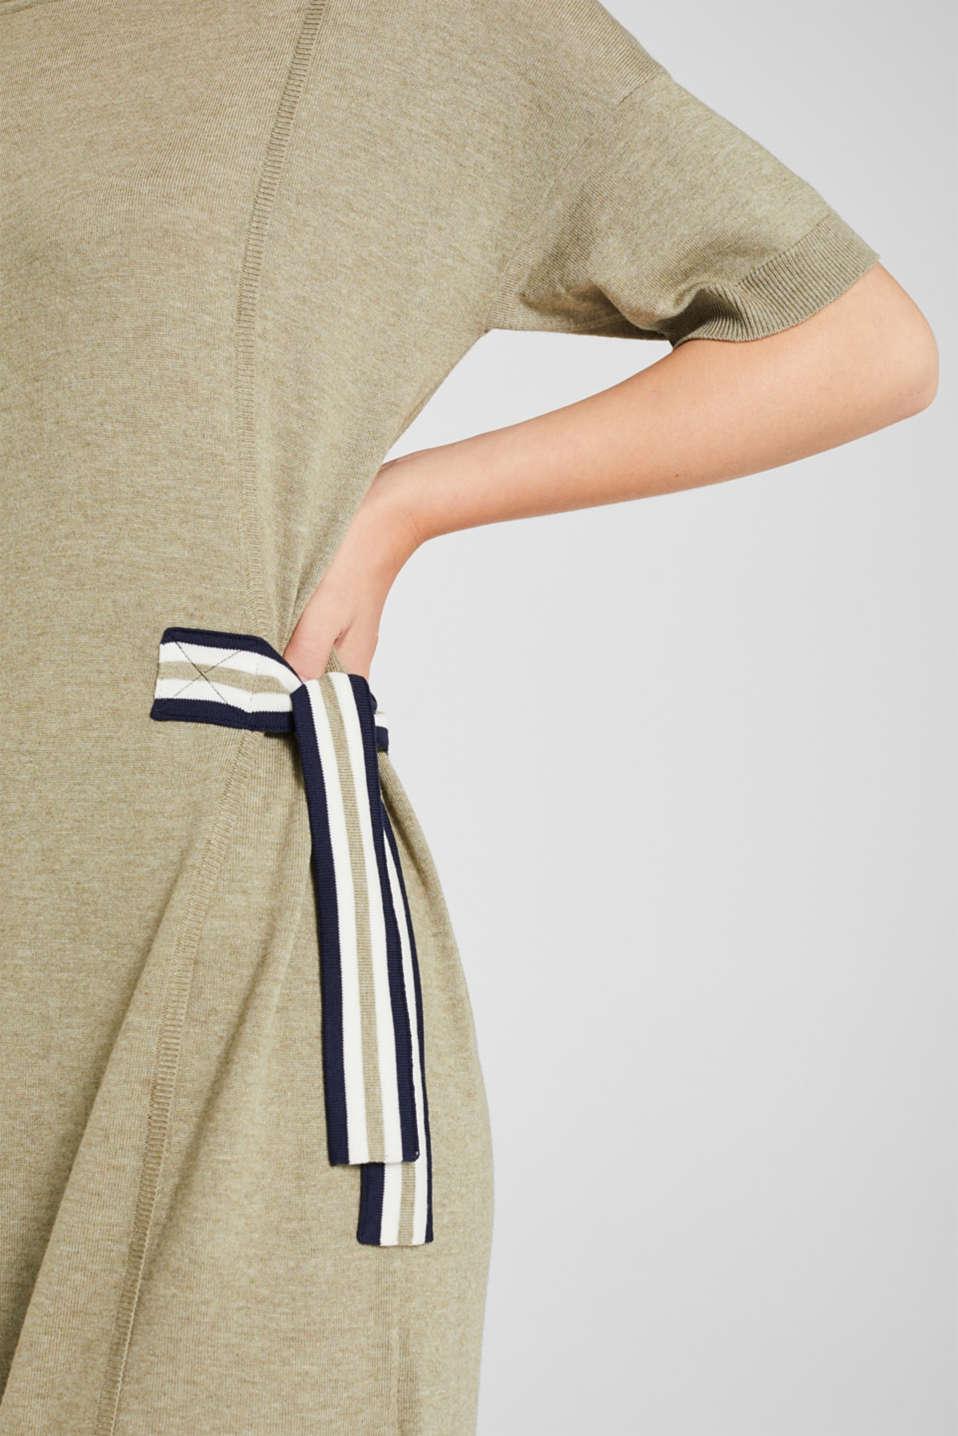 Bow detail knit dress, KHAKI GREEN 5, detail image number 3